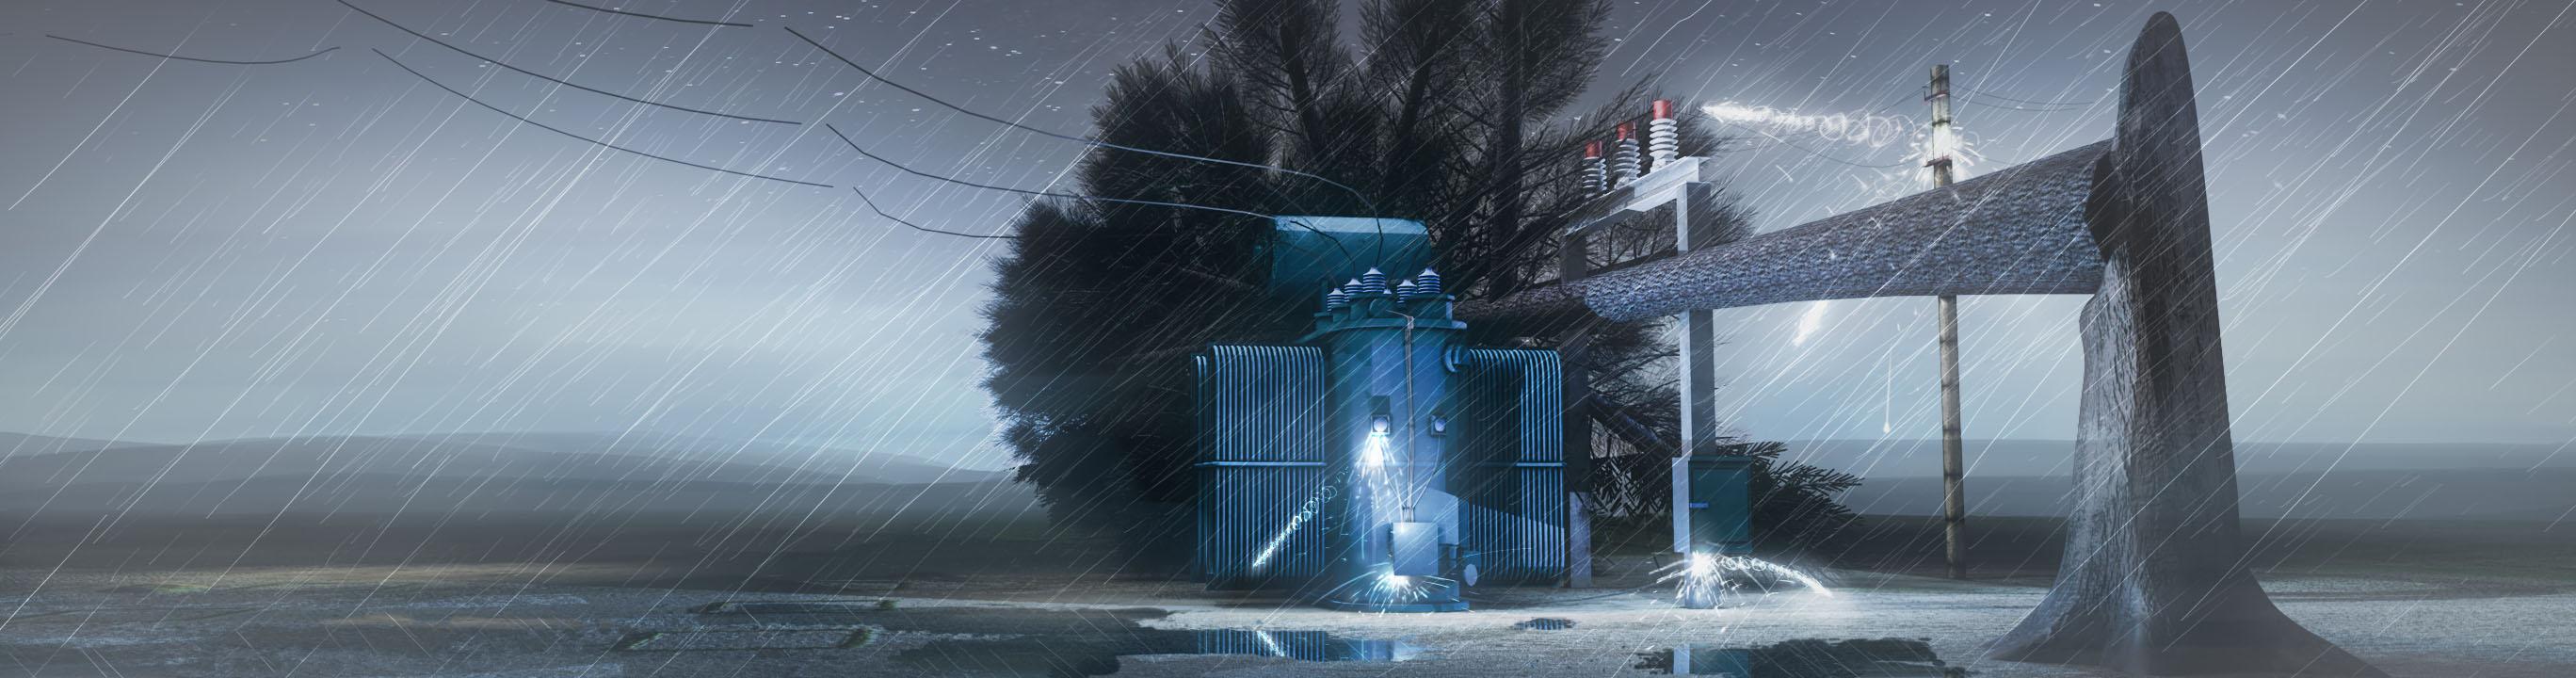 GE4062_LookDev_Transformer_v09B